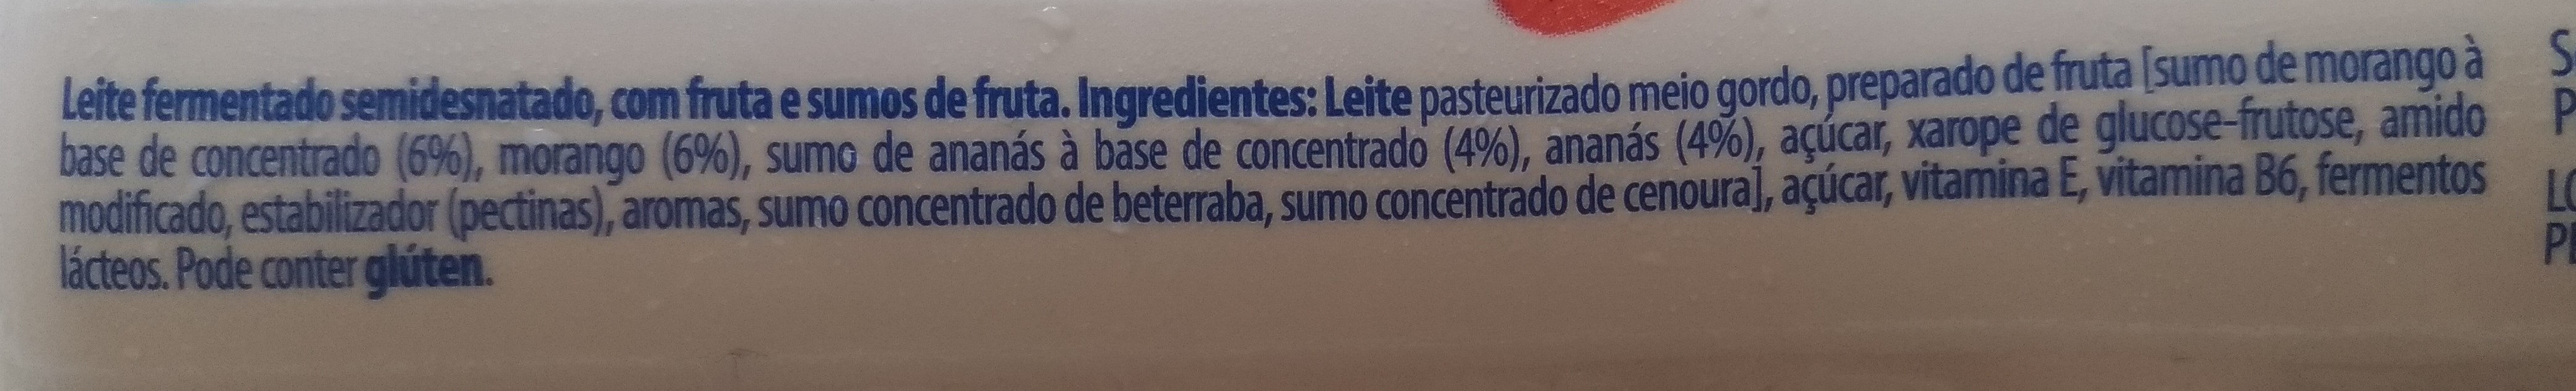 Nestlé yoggi Smoodi morango é ananás - Ingredients